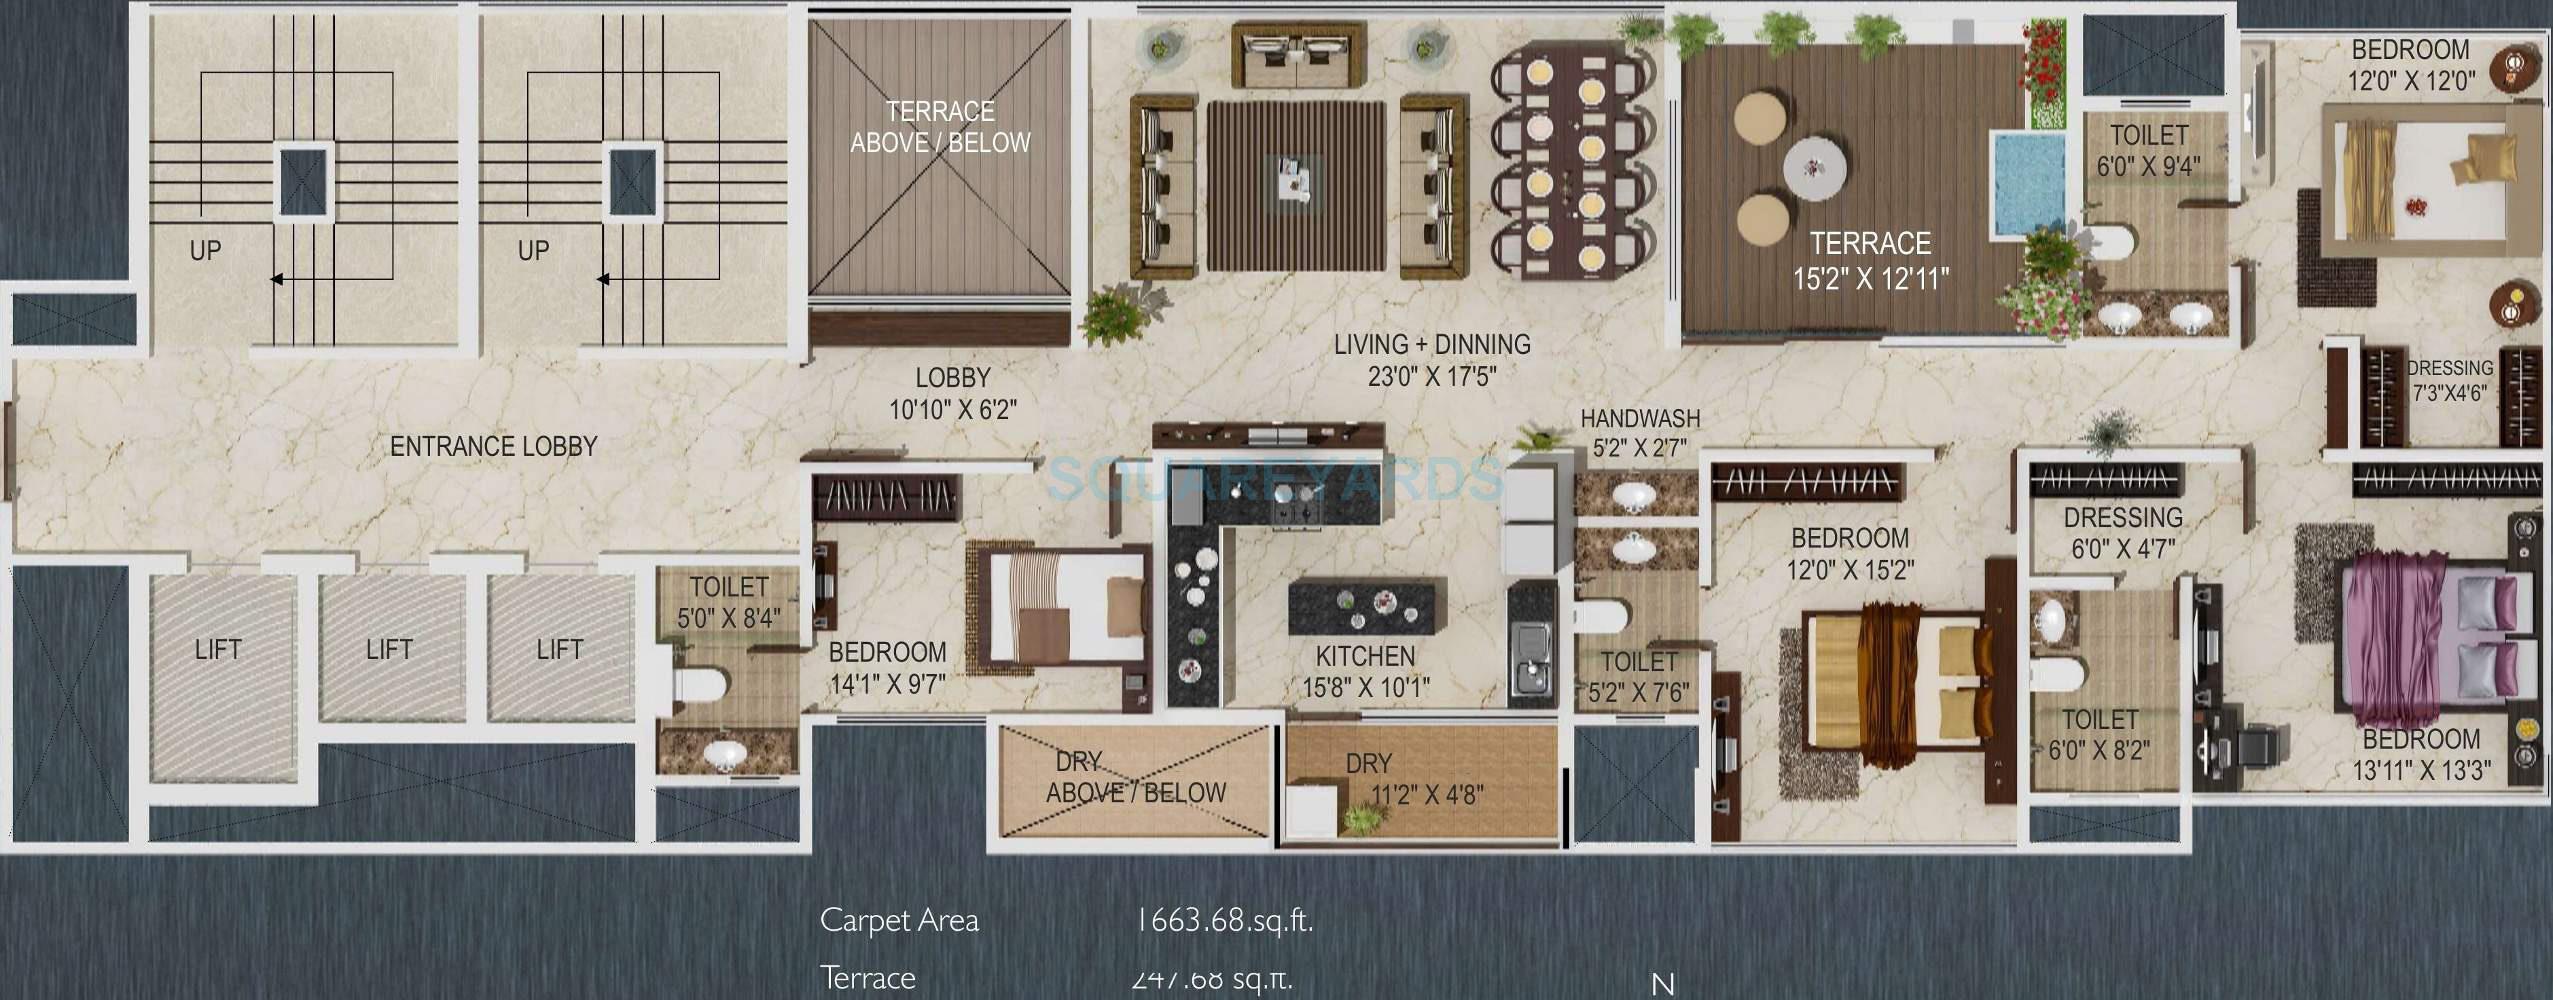 paranjape schemes sky one apartment 4bhk 3493sqft 11011